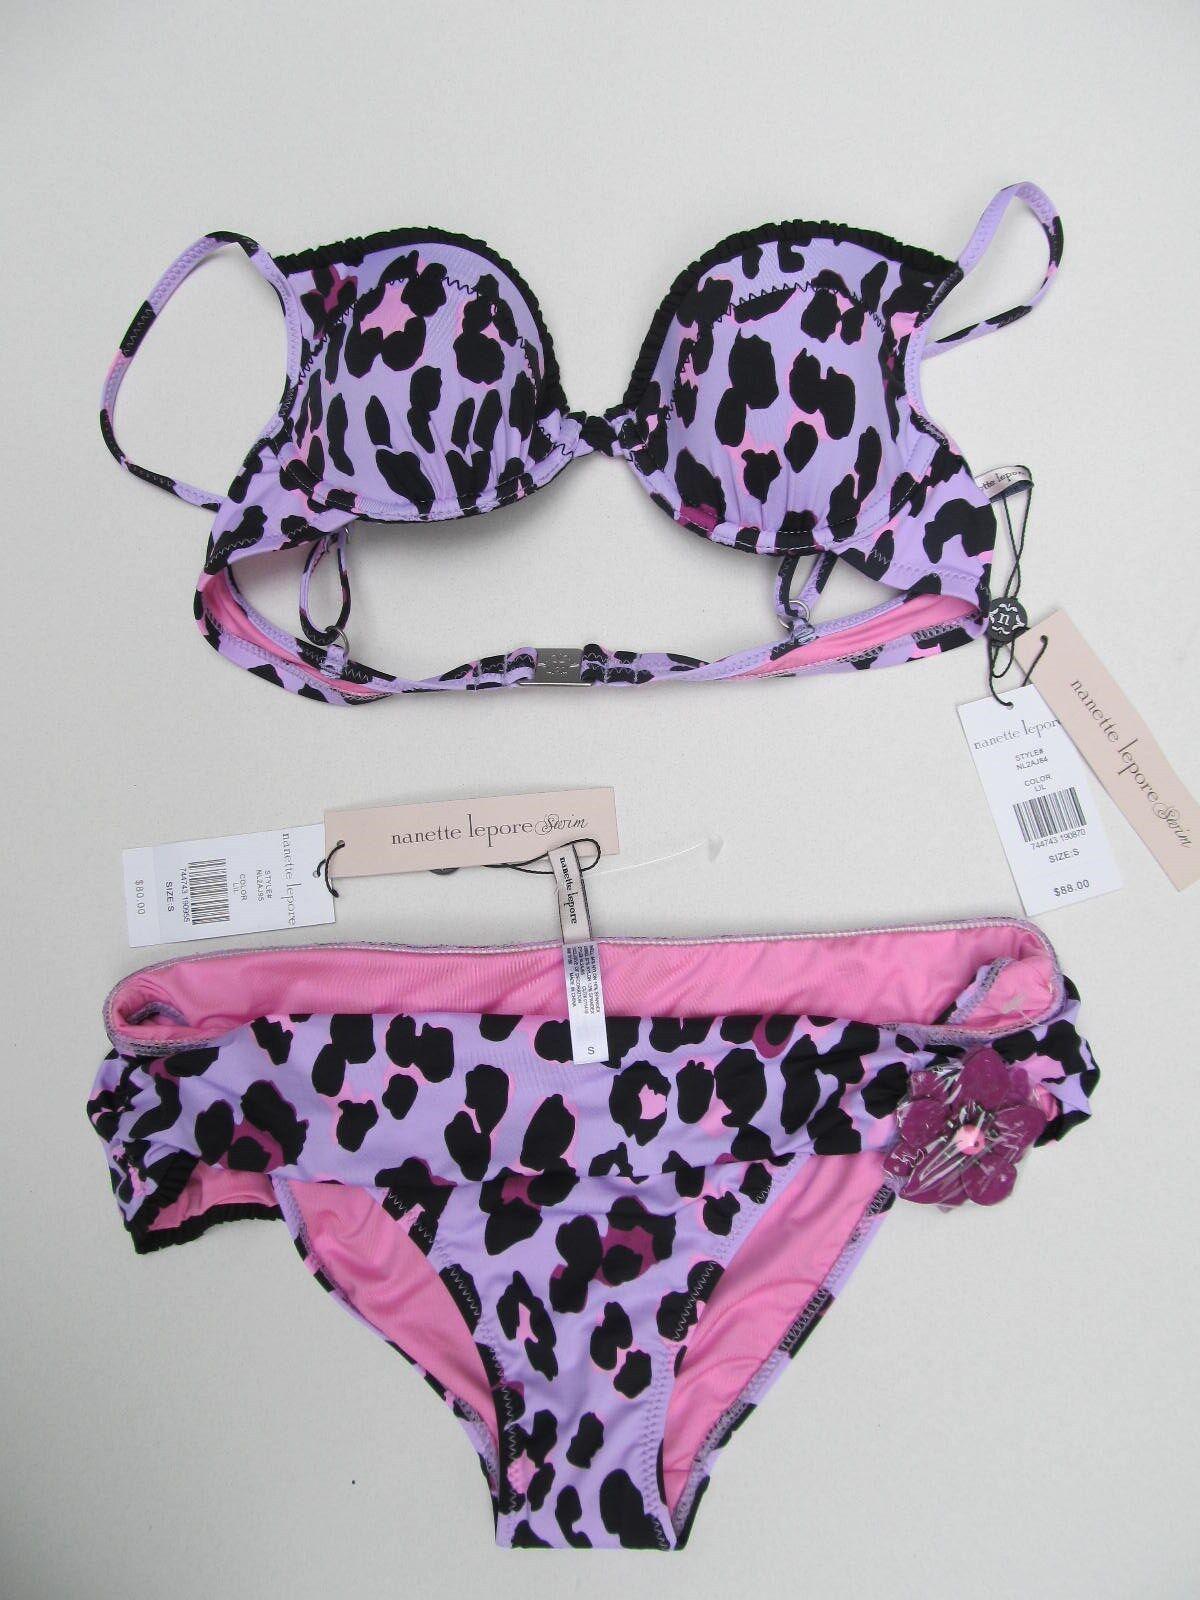 Nanette Lepore Womens Bikini 2 Pc Bathing Suit Purple Leopard Small NWT